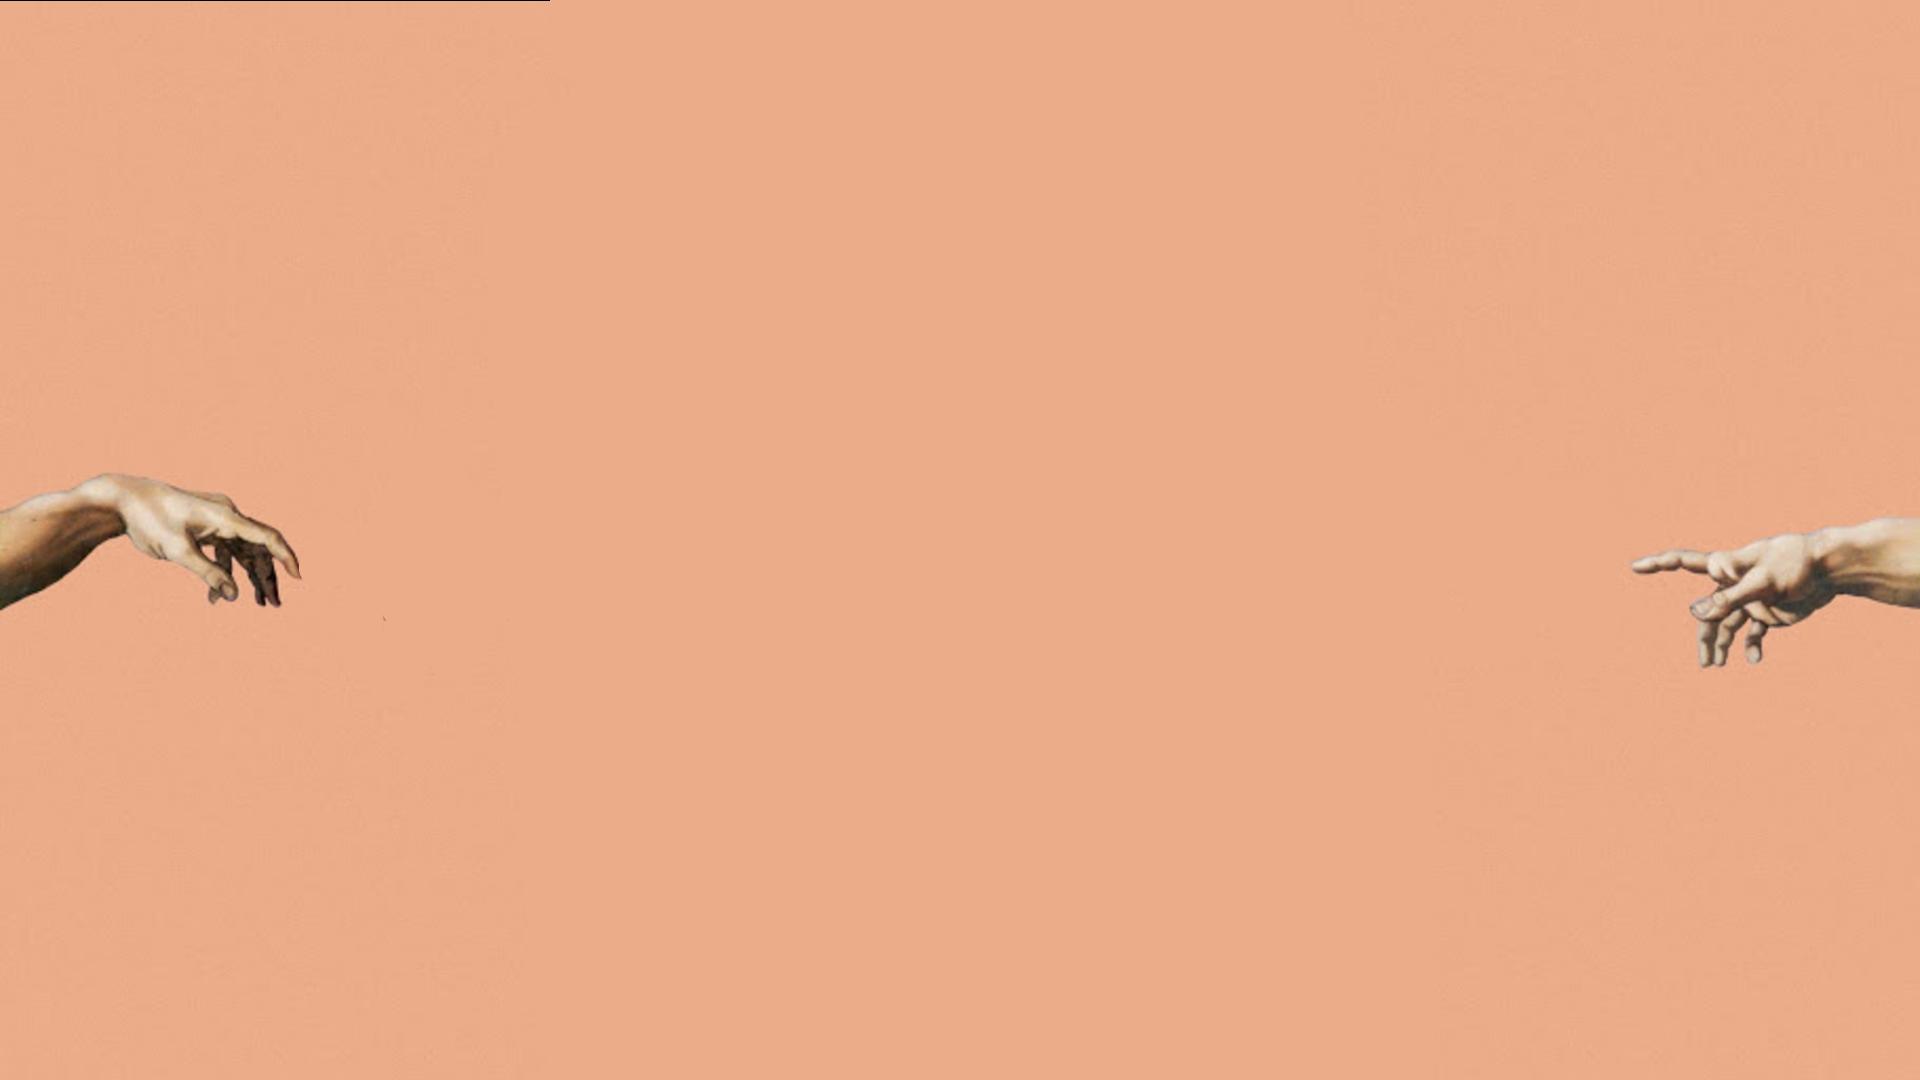 Pink Aesthetic Desktop Wallpaper Adam And God Fingers Trendy Backgrounds Peach Aesthetic Desktop Wallpaper Minimalist Desktop Wallpaper Cute Desktop Wallpaper